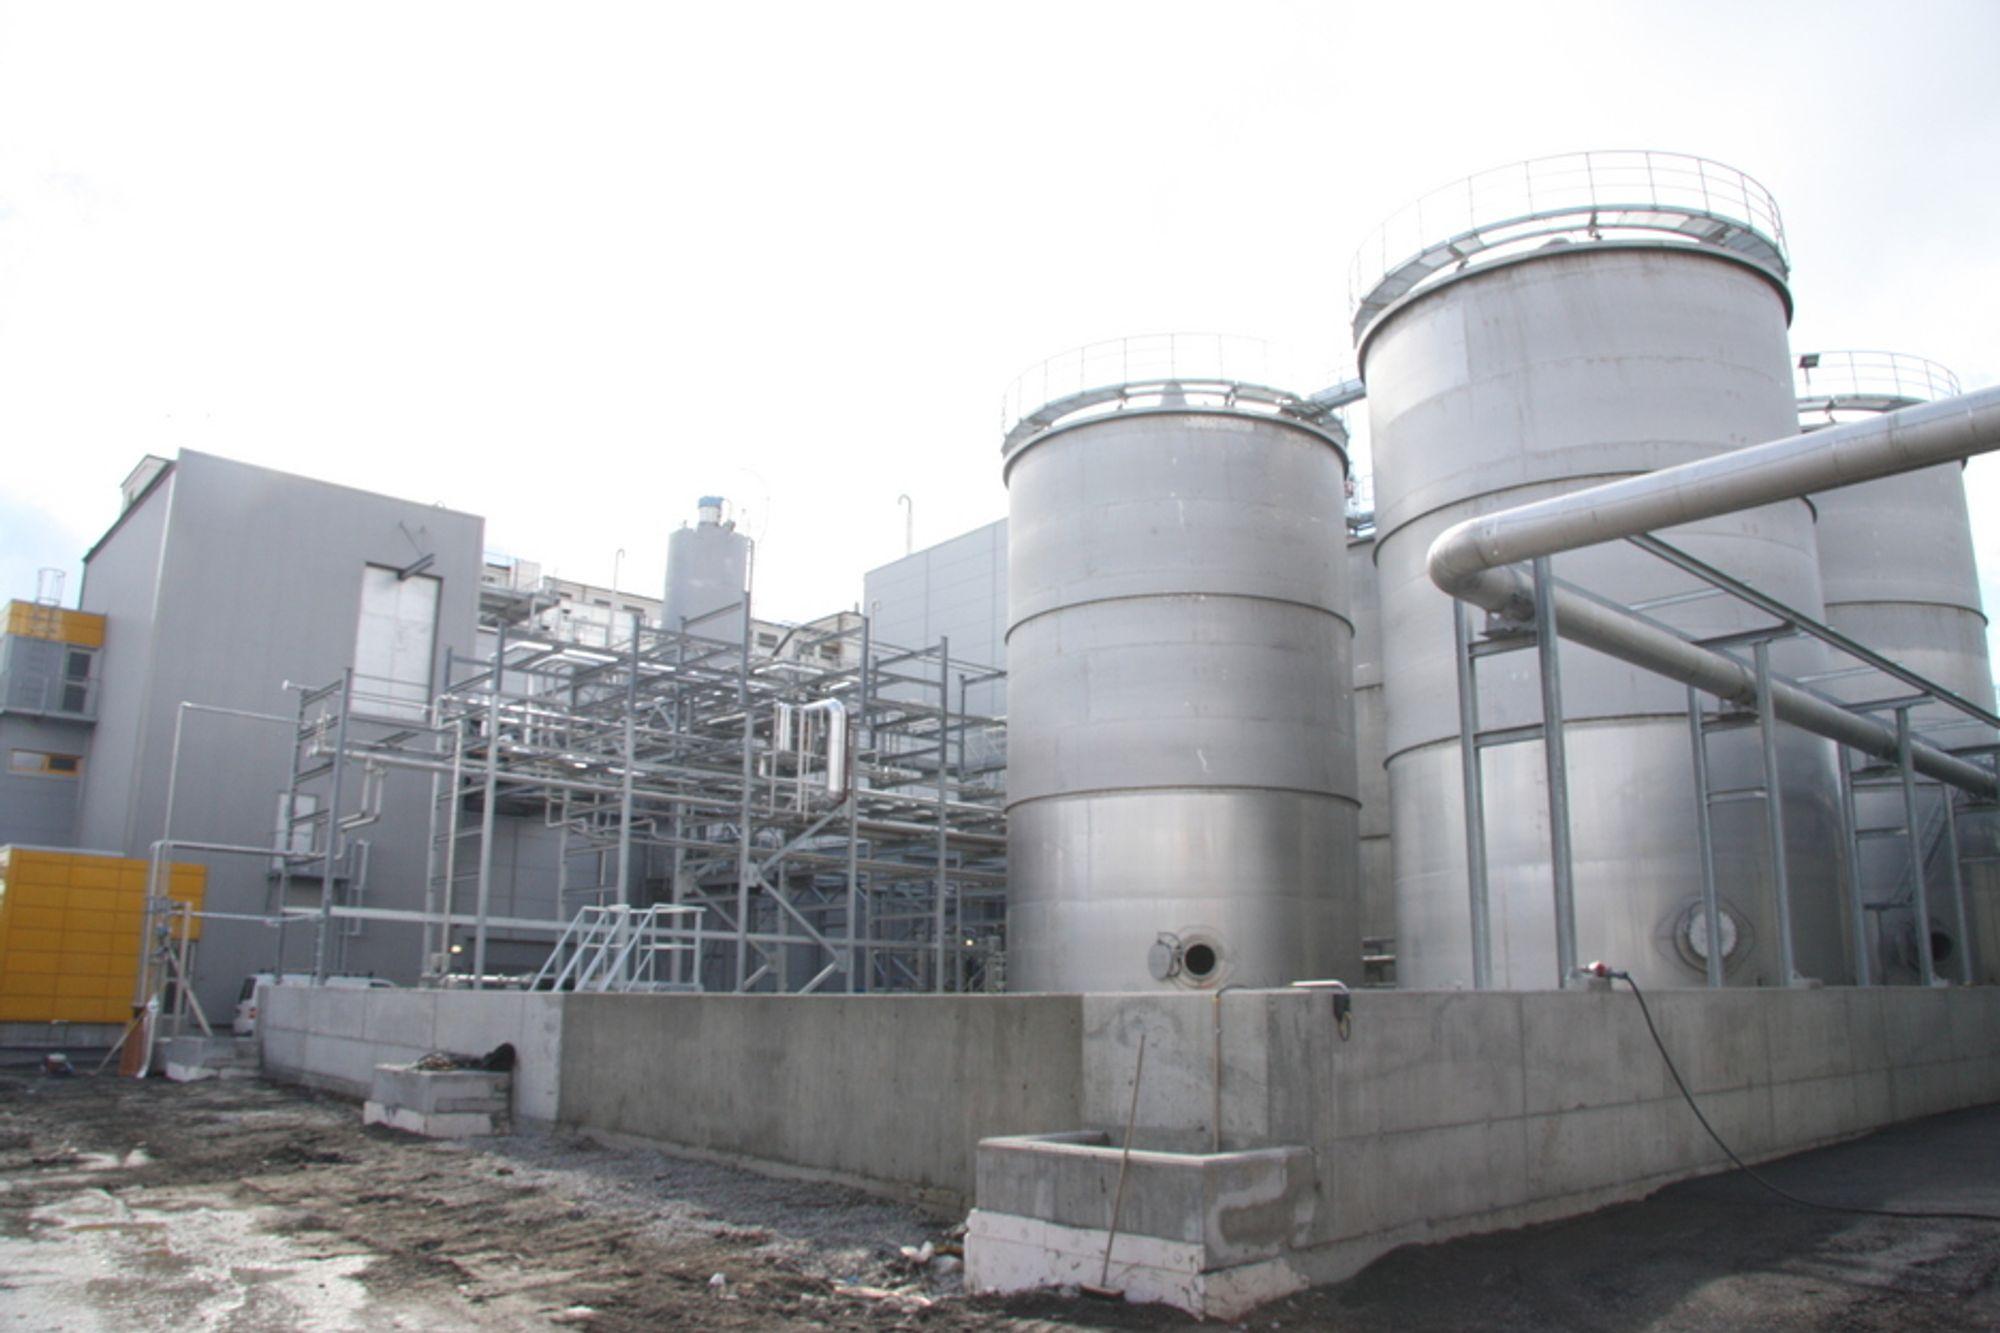 Uniol biodieselanlegg, Fredrikstad